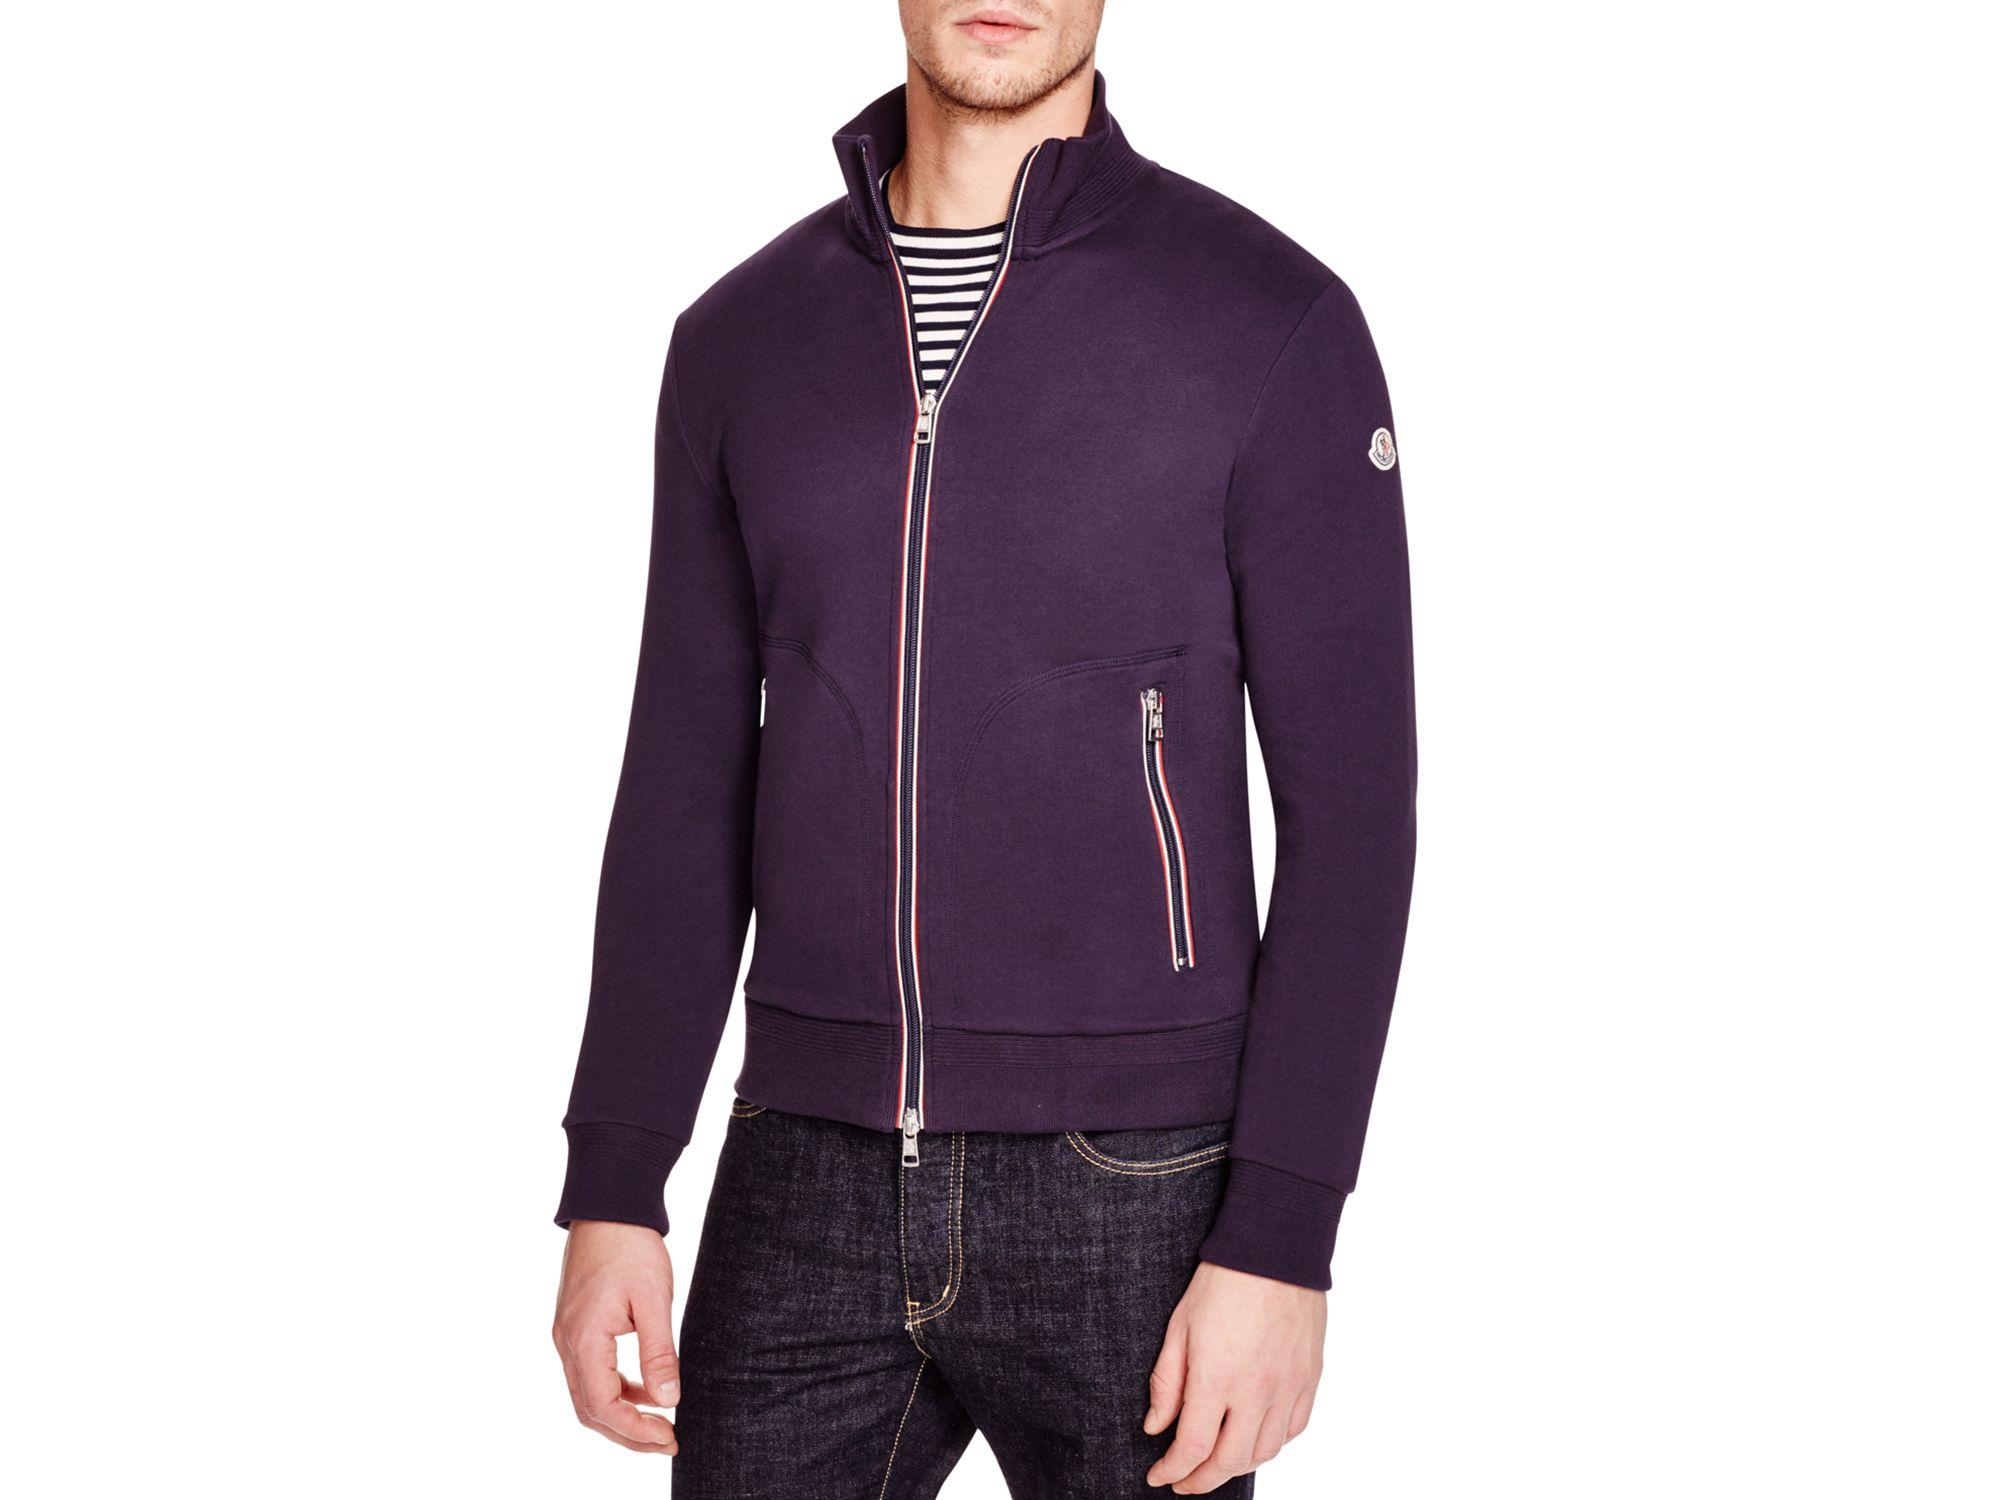 moncler zip sweater